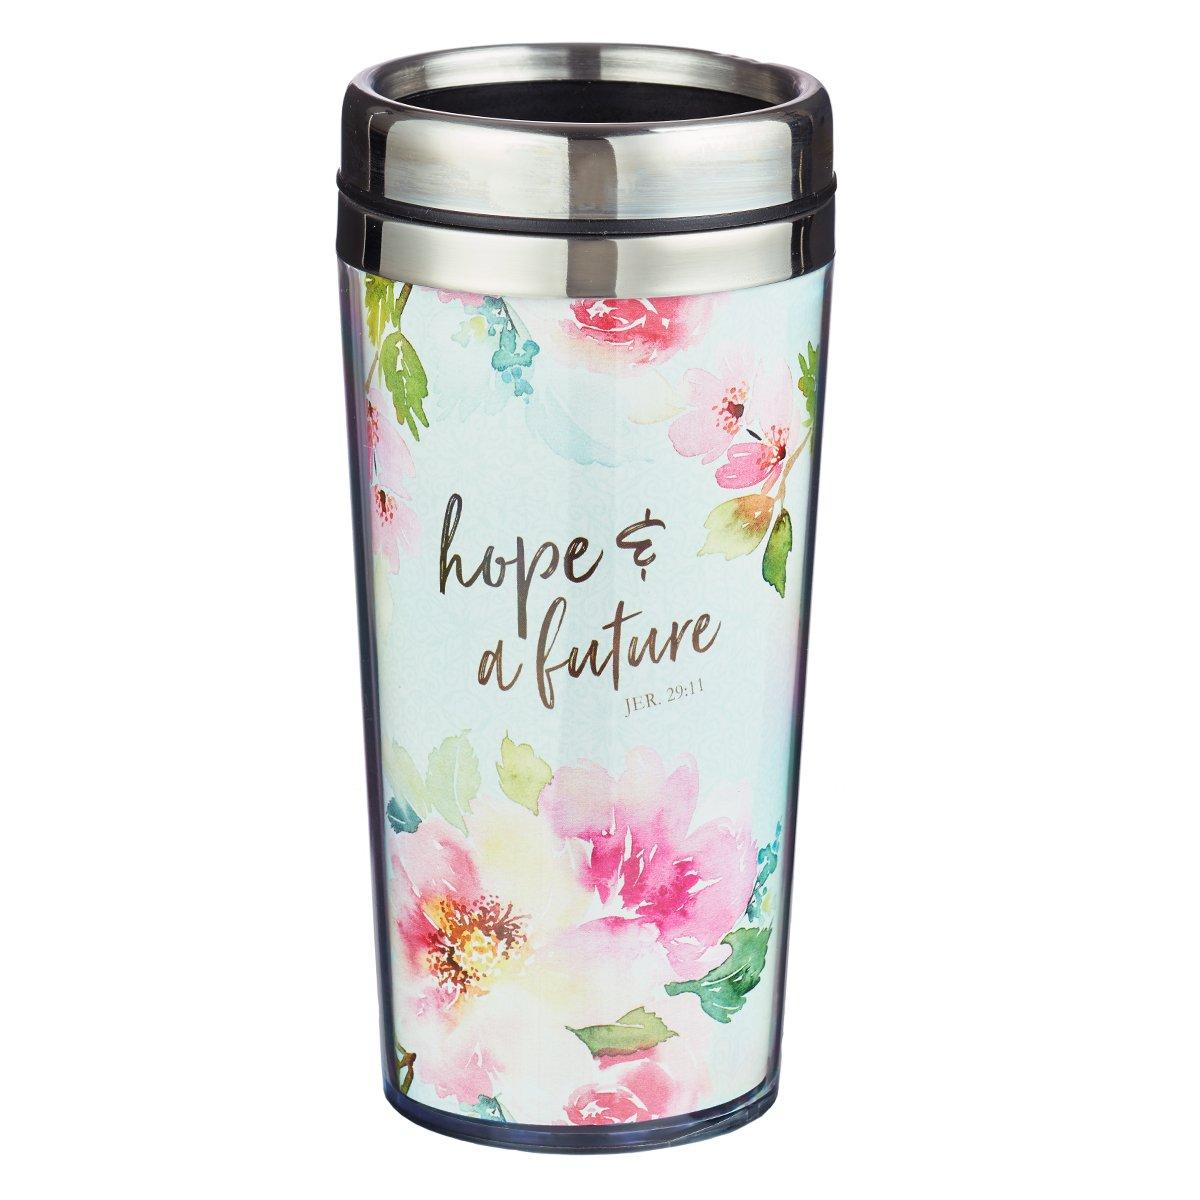 Coffee Travel Mug: Hope and Future - Jeremiah 29:11